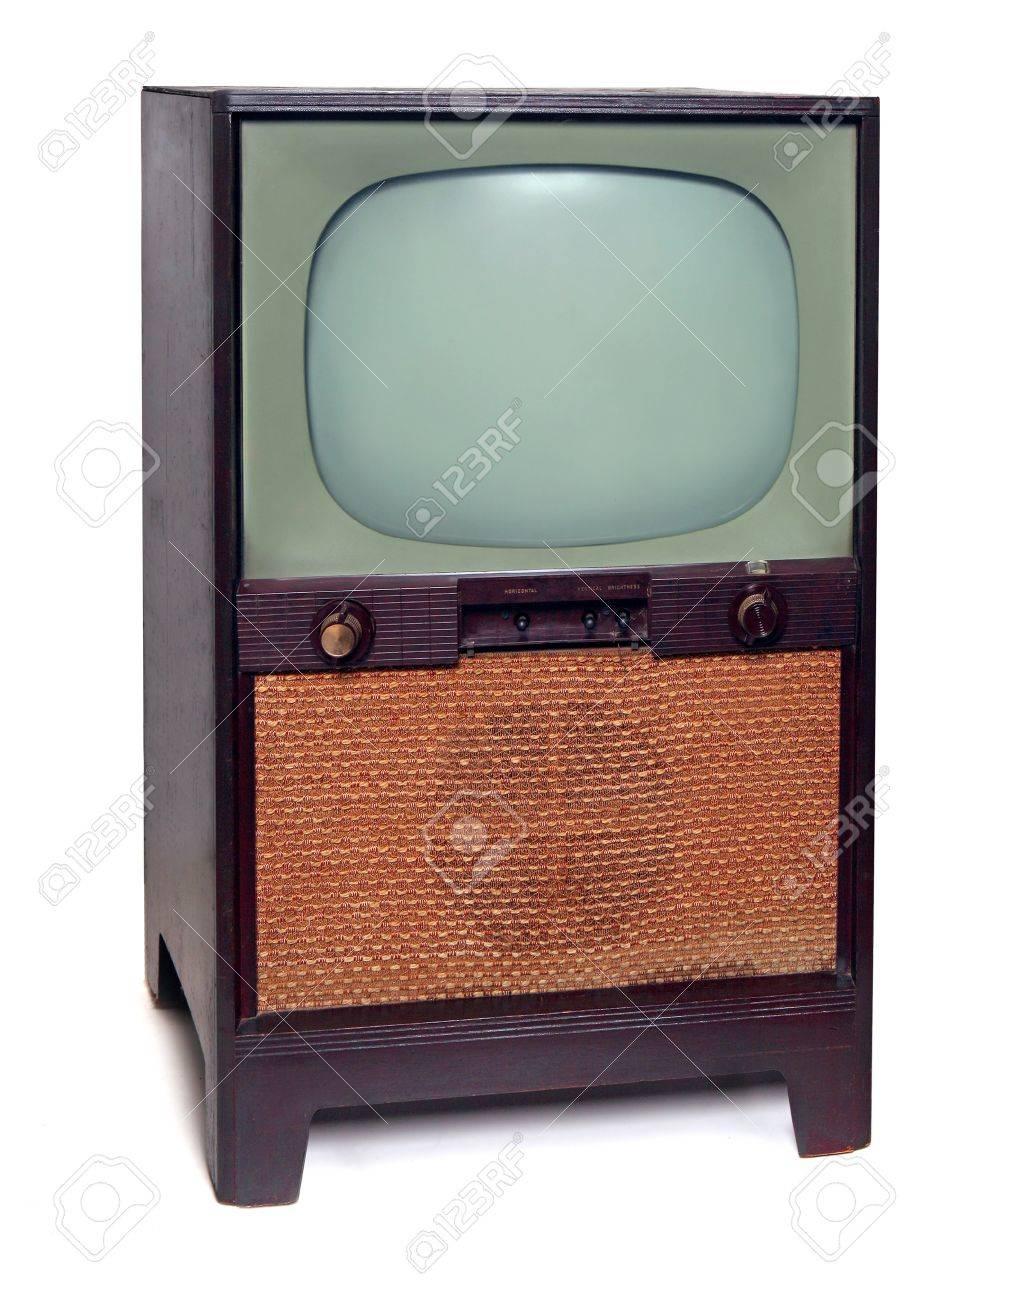 1950 Vintage TV Television  Isolated on White Background Stock Photo - 10425115